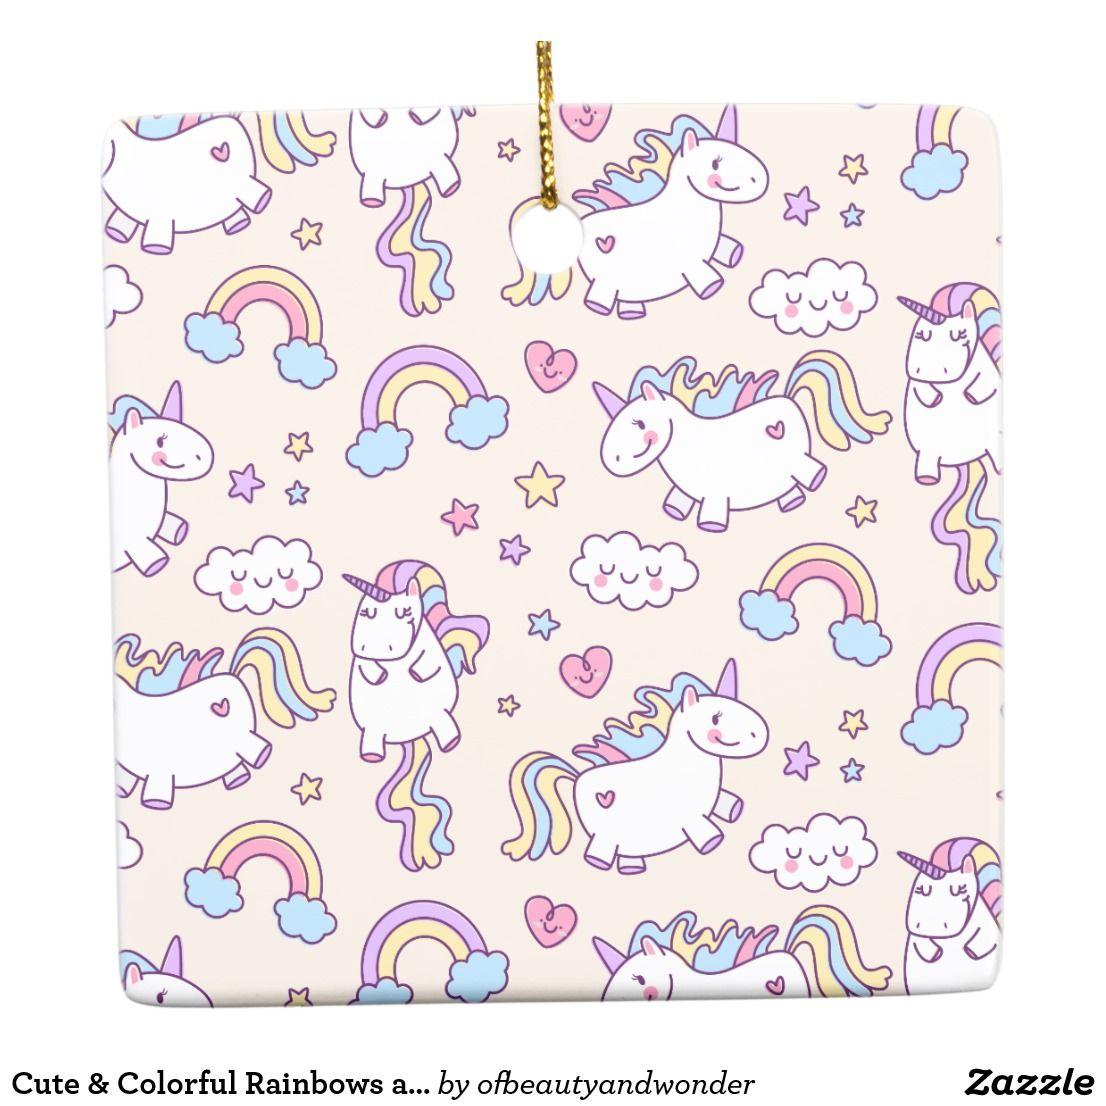 Cute & Colorful Rainbows and Unicorns | Ornament